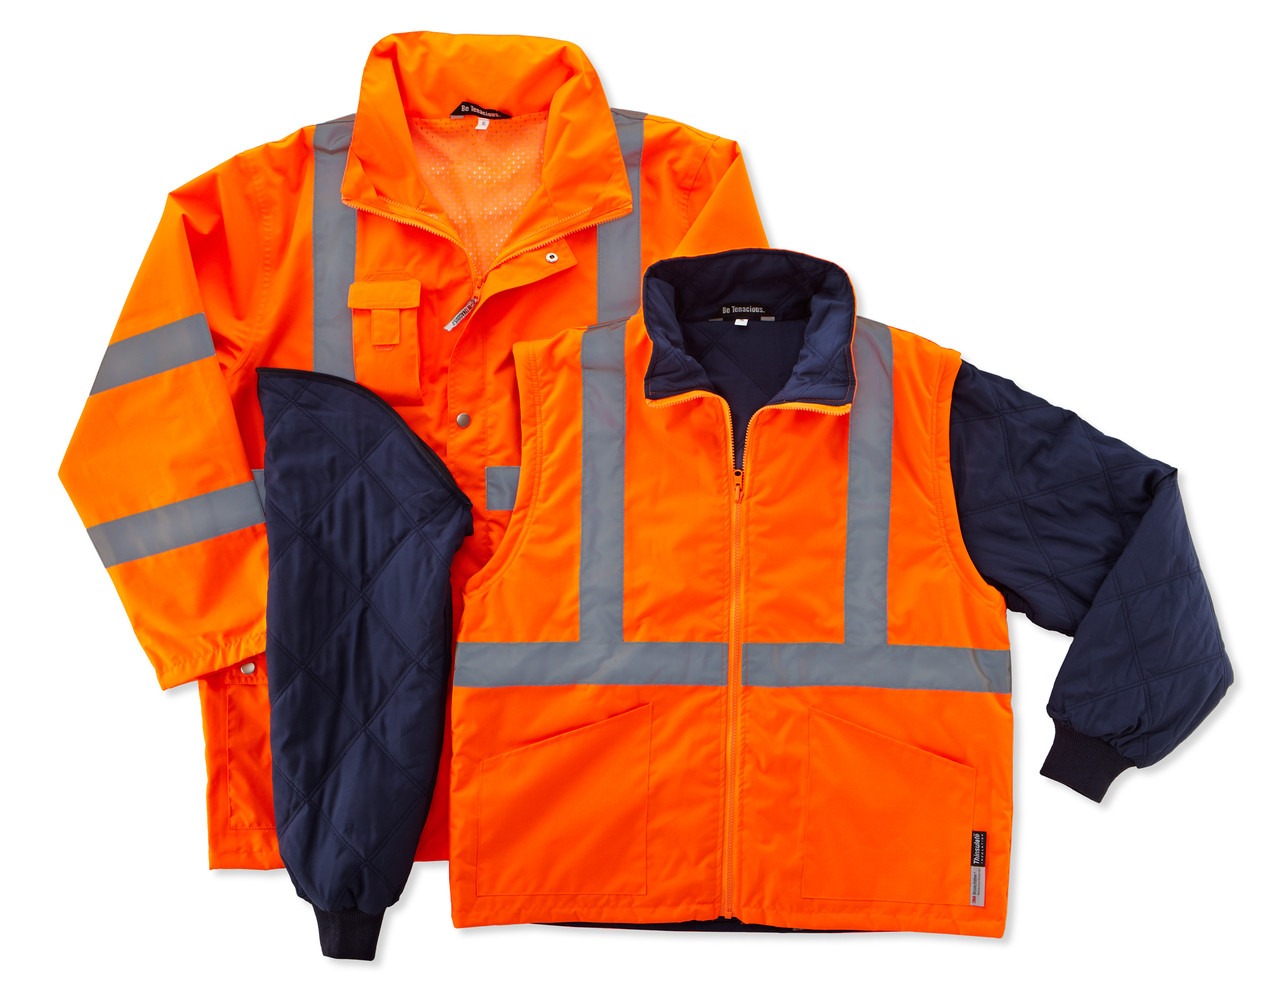 Ergodyne GloWear 8385 ANSI High Visibility 4-in-1 Reflective Safety Jacket 5XL Lime